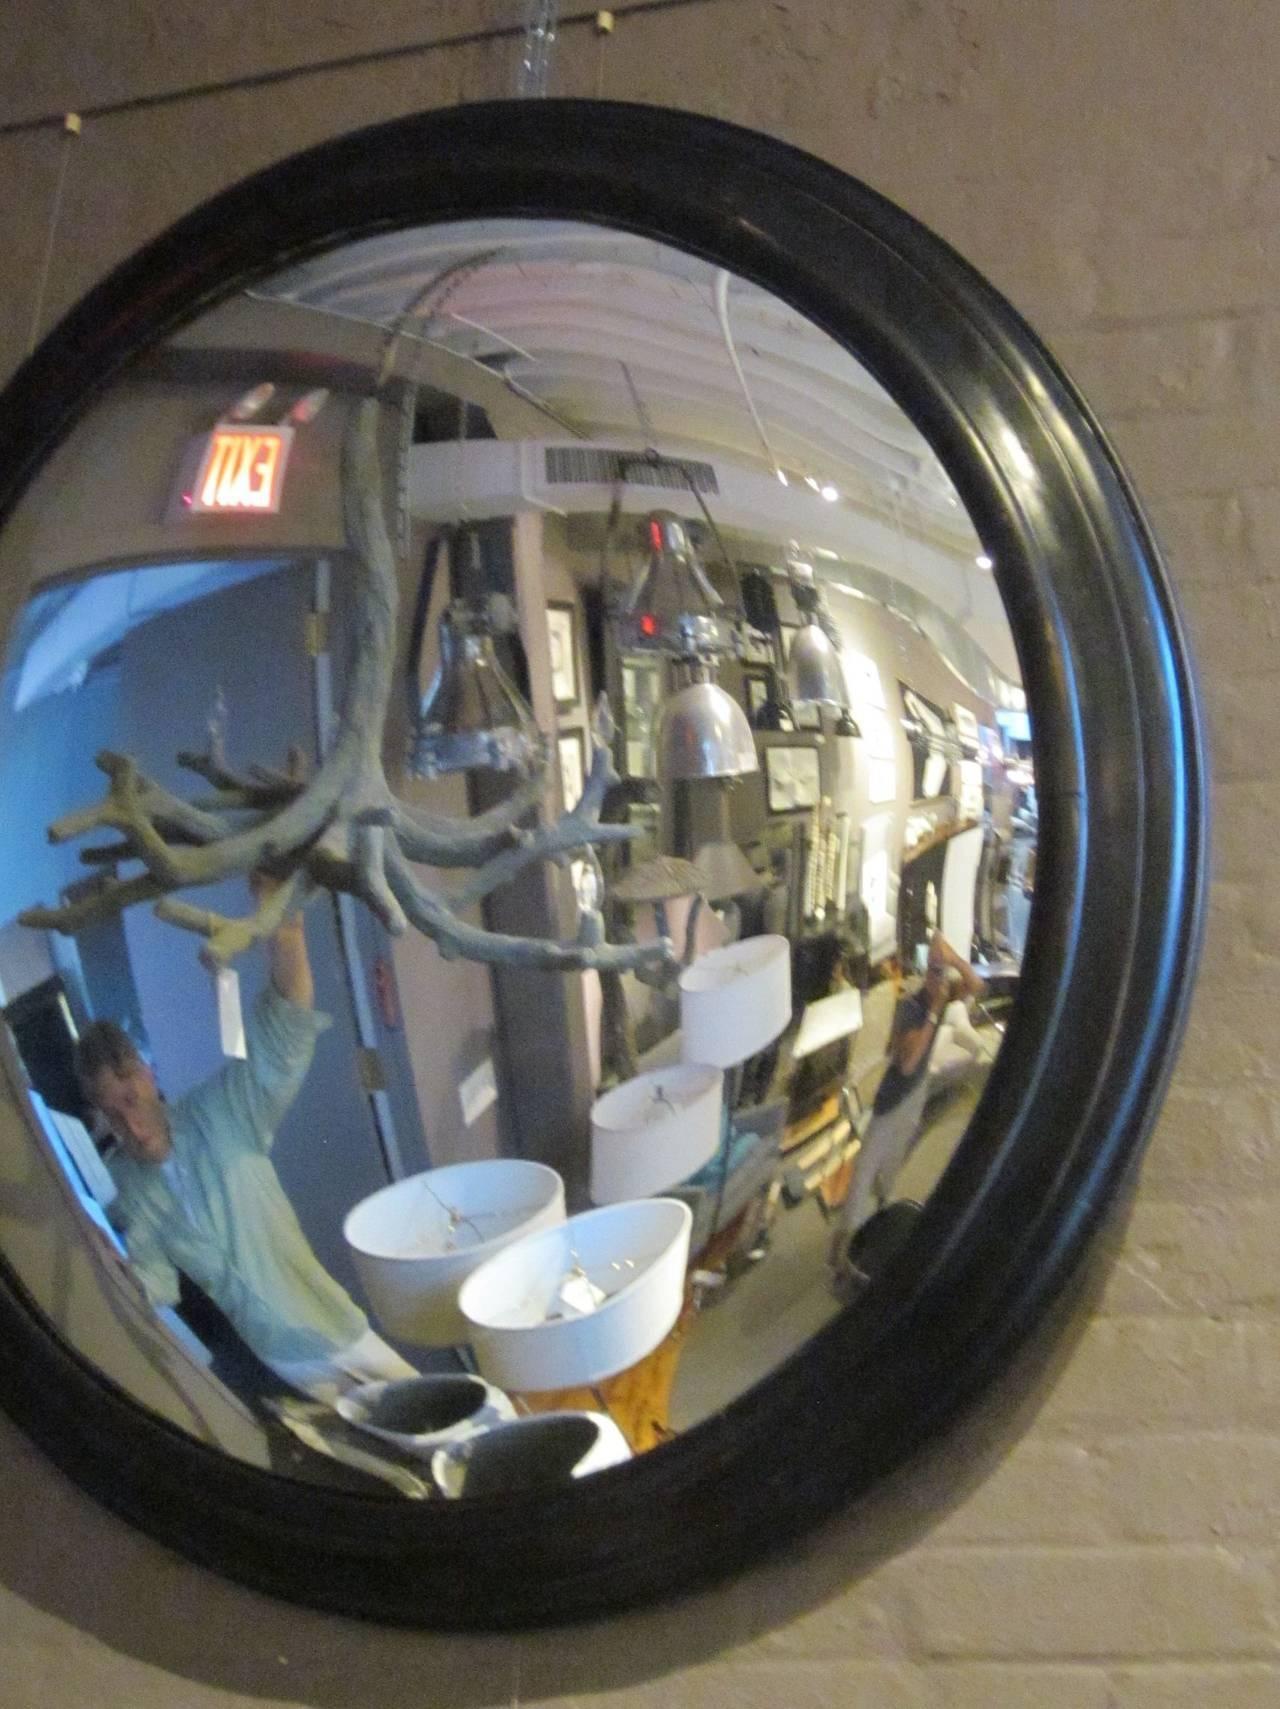 French Napoleon Iii Extra-Large Round Convex Mirror In Black Frame regarding Round Convex Mirrors (Image 12 of 25)